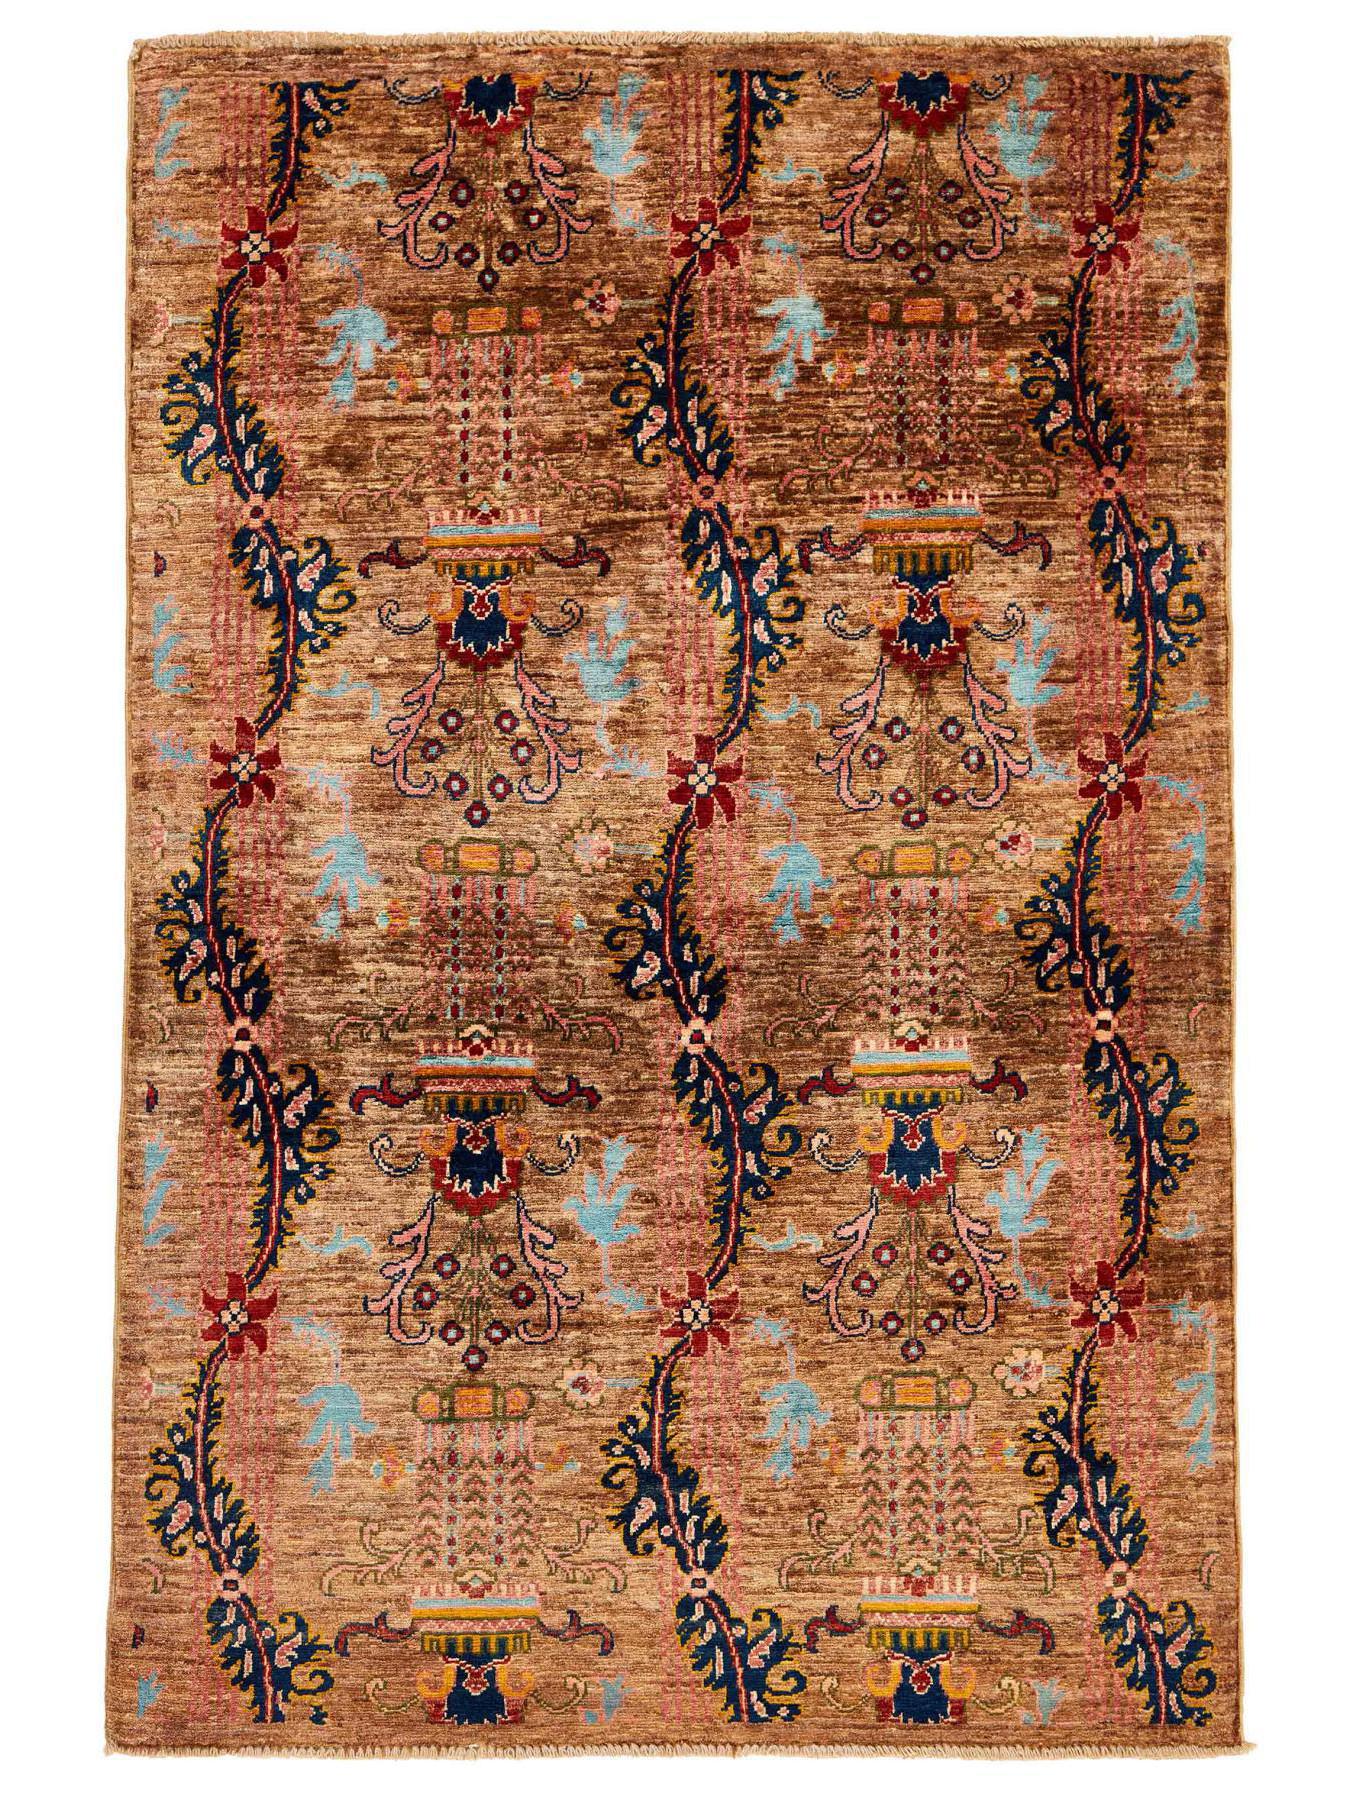 Ziegler carpets - Ghaznavi neo-classic Fine Ariana Style